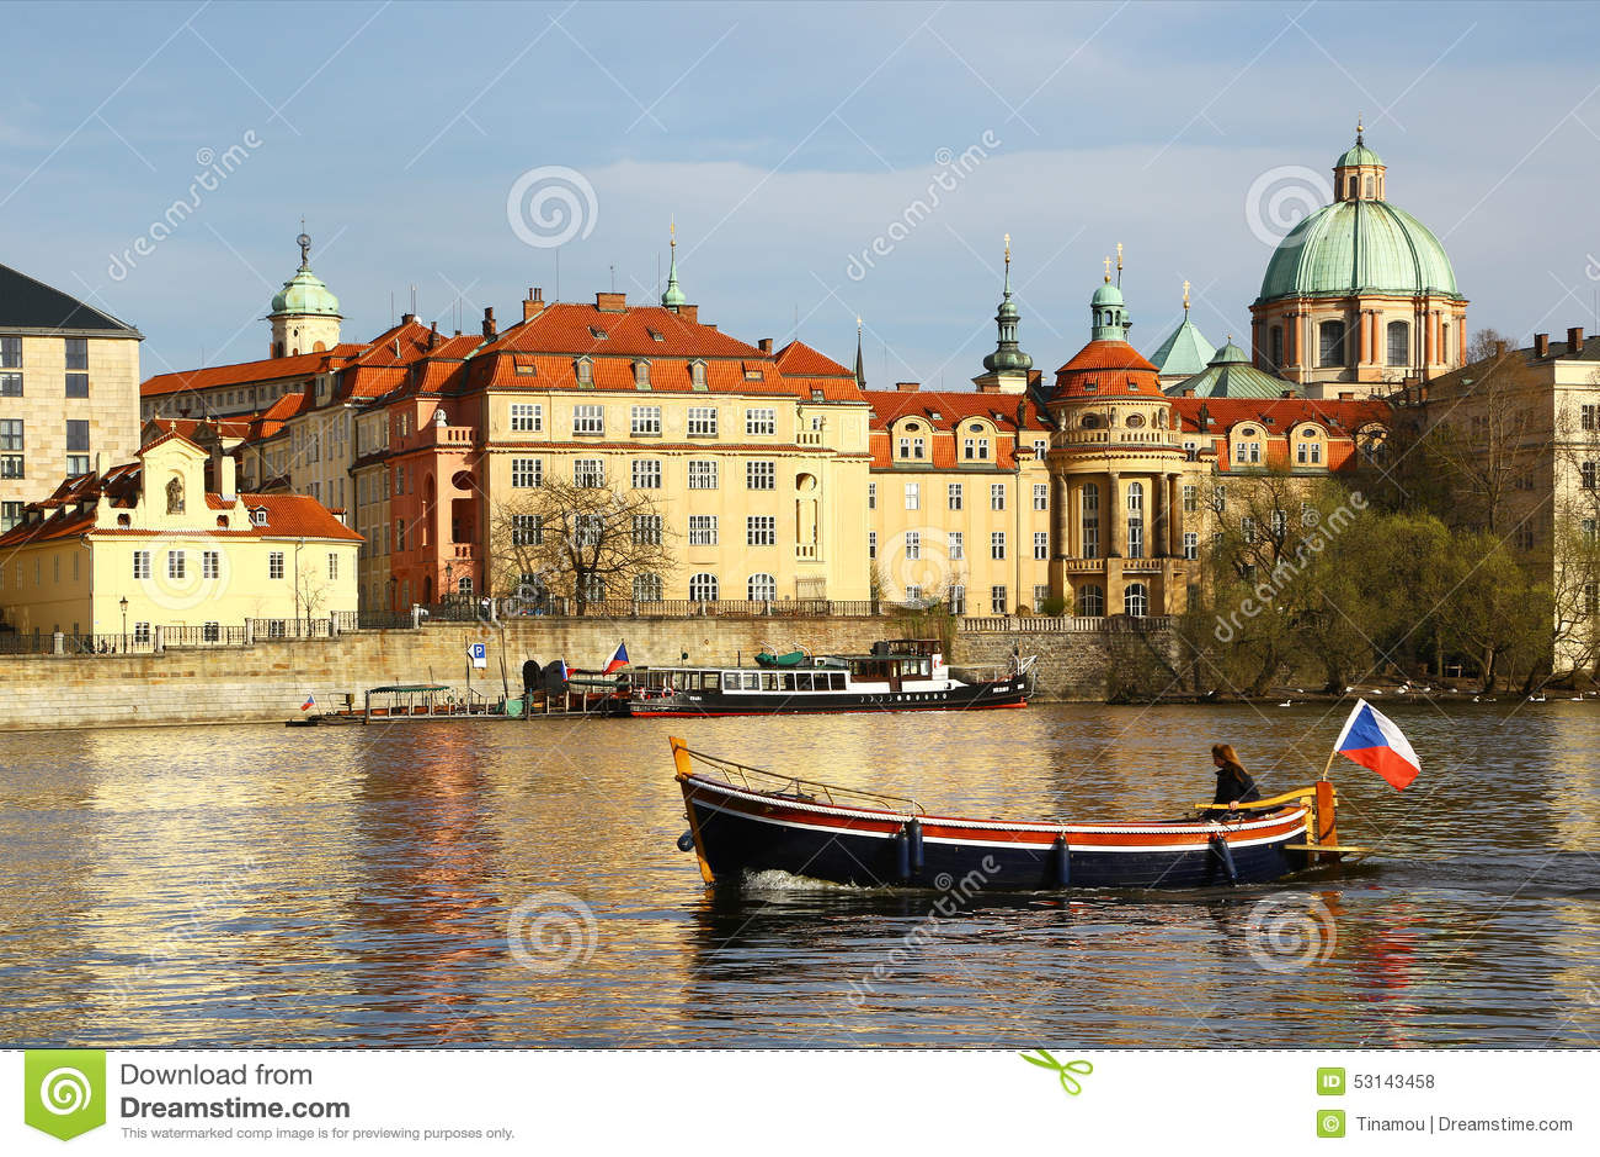 Boat Sails On Vltava River In Central Prague Editorial Stock Photo - Image: 53143458